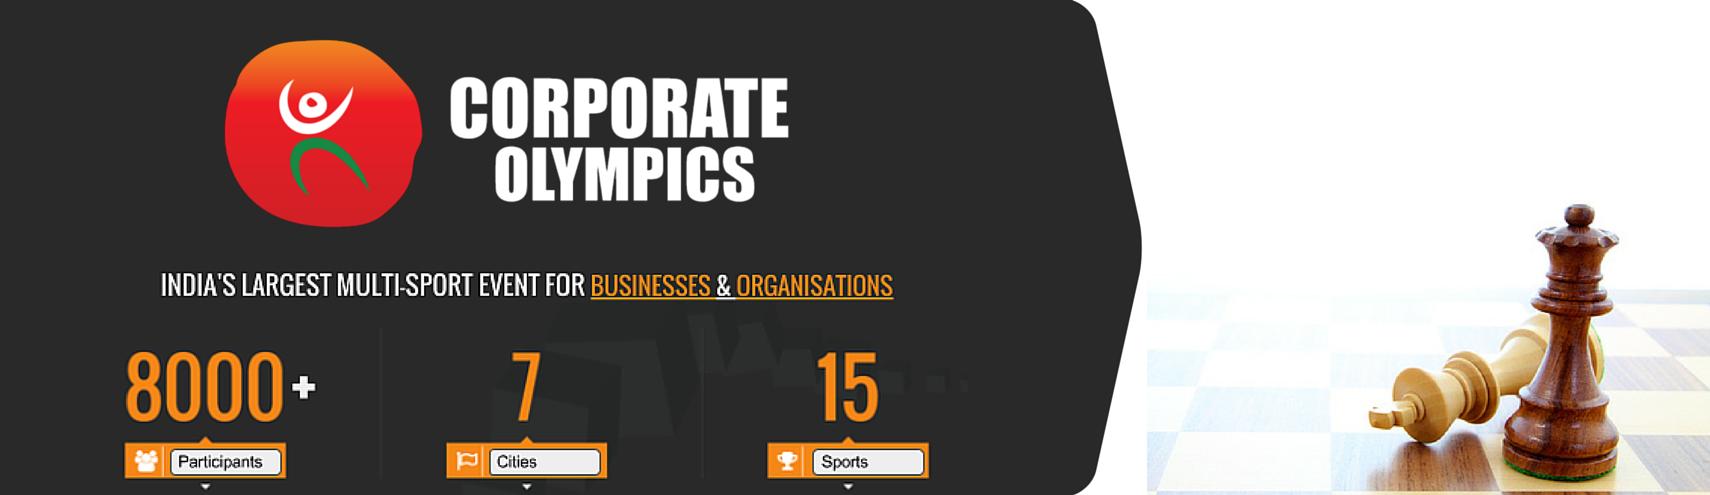 Chess - Life Republic Corporate Olympics